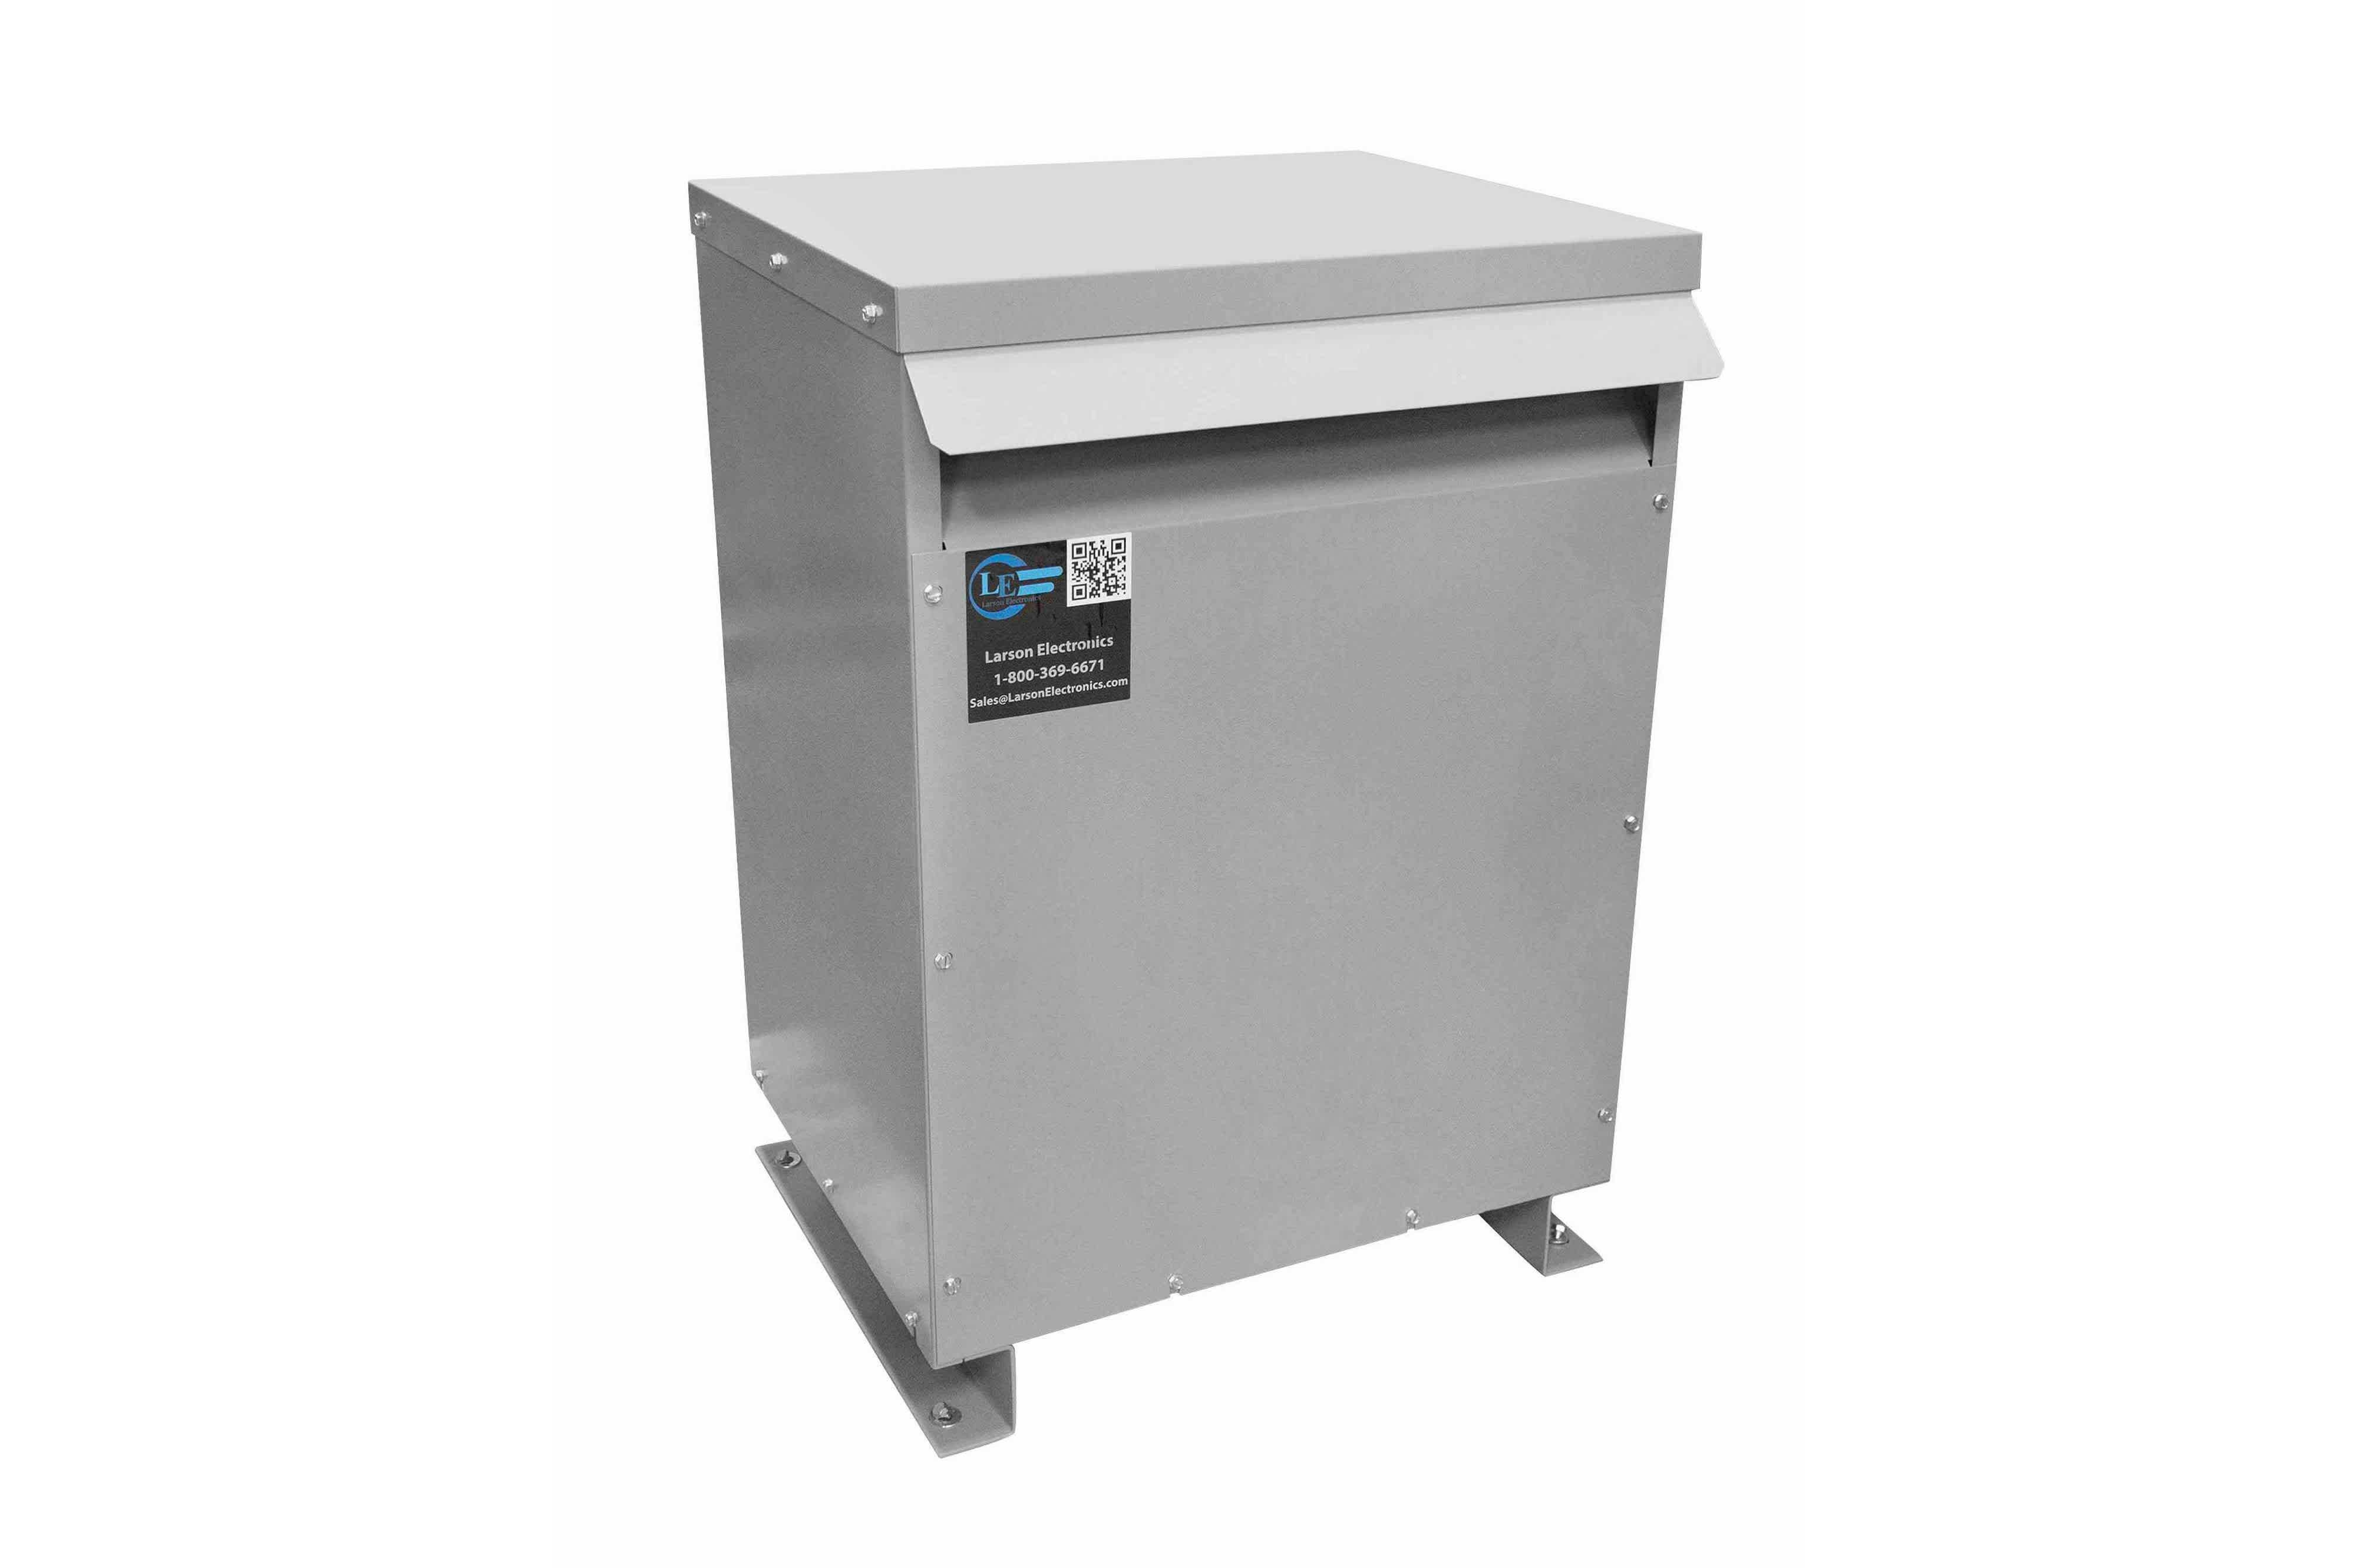 167 kVA 3PH Isolation Transformer, 460V Wye Primary, 240V/120 Delta Secondary, N3R, Ventilated, 60 Hz